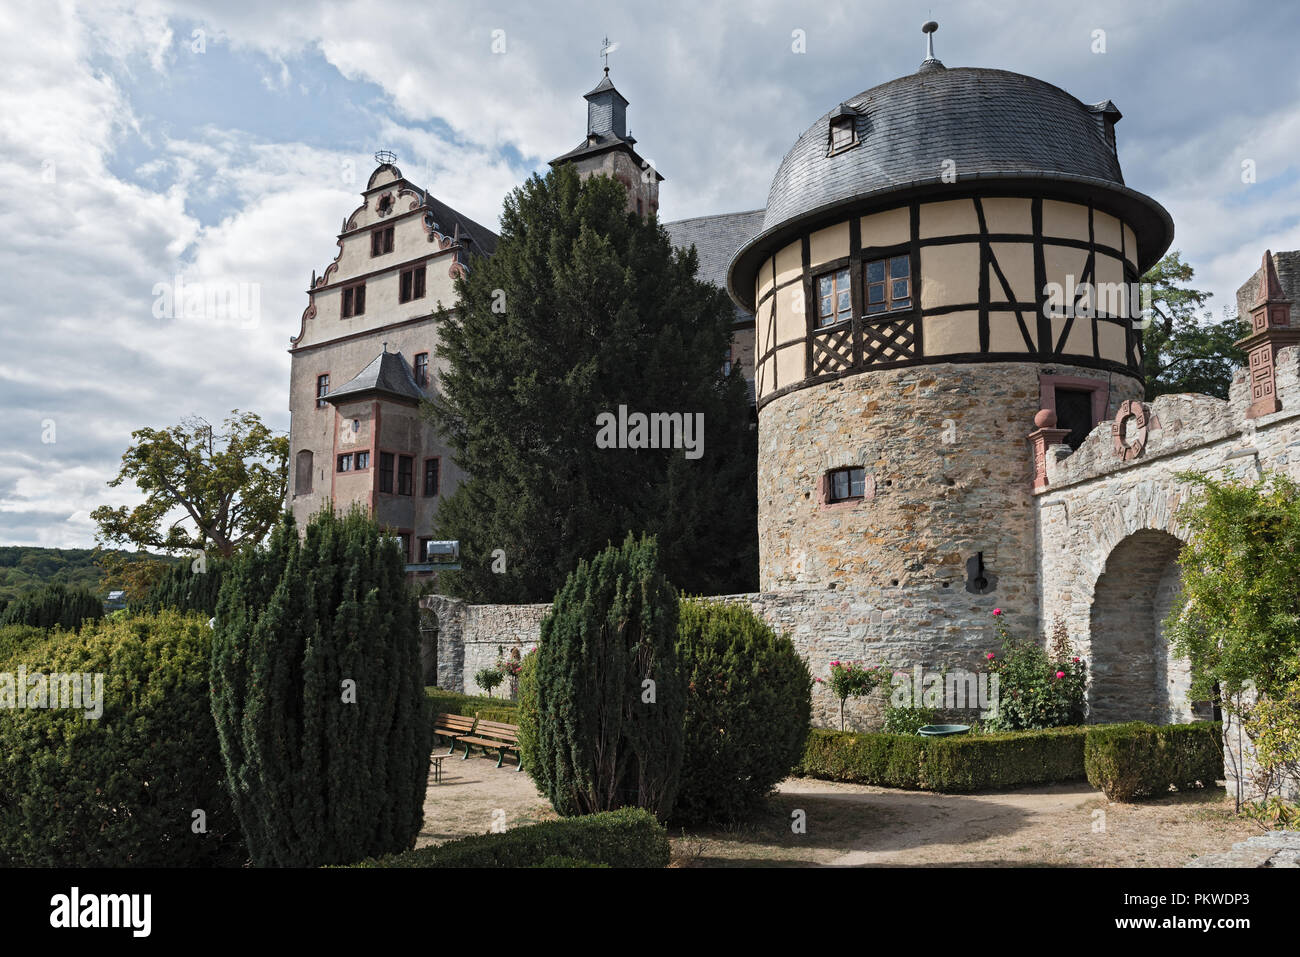 High Middle Ages Rock castle in Kronberg im Taunus, Hesse, Germany. - Stock Image